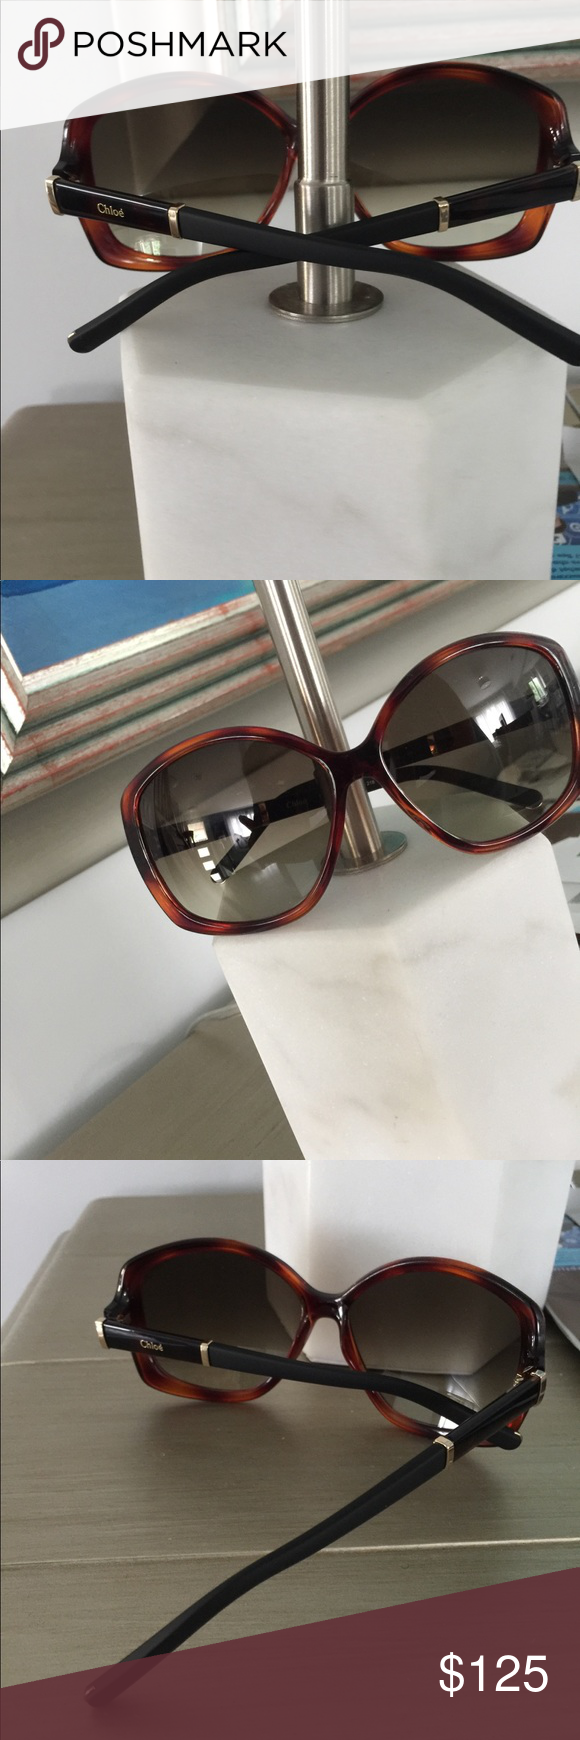 ff4e334b109b Chloé Sunglasses for women!!! - Original - New!! - Without case Chloe  Accessories Glasses